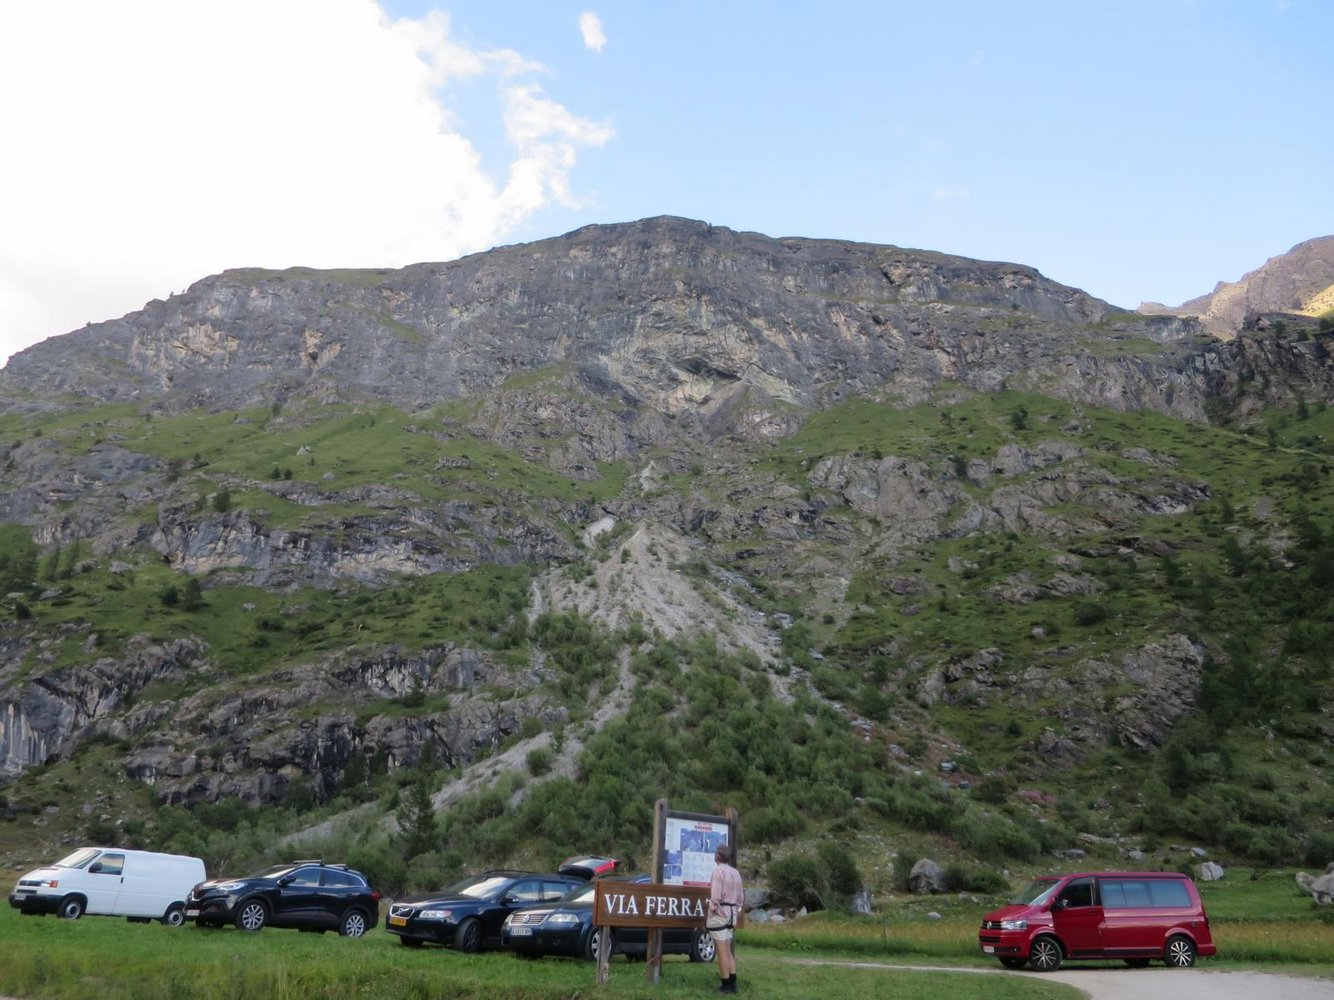 Klettersteig Lauterbrunnen : Via ferrata dandagne bergsteigen.com